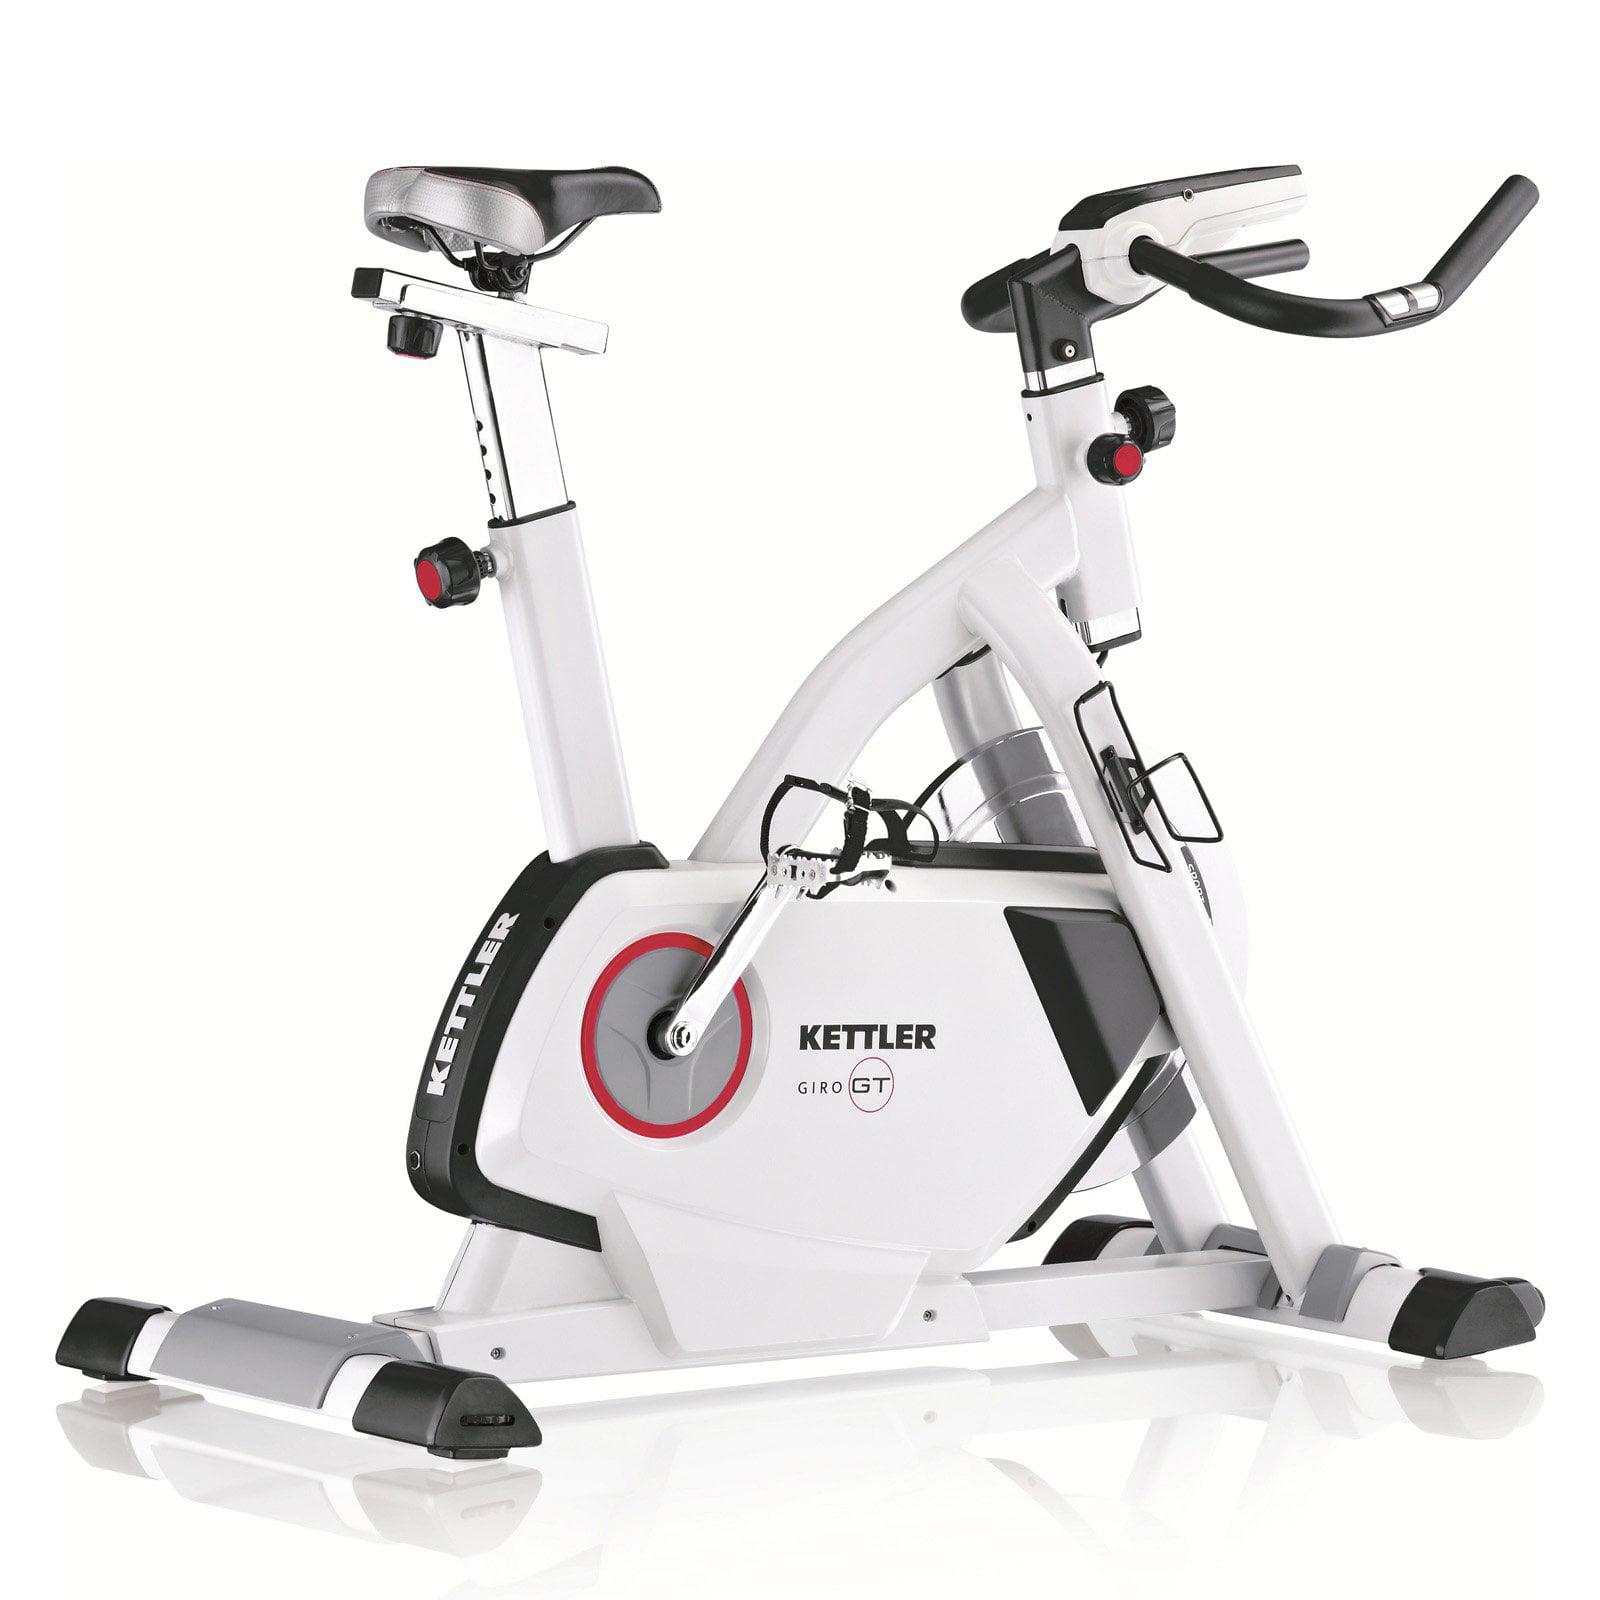 KETTLER® Advantage GIRO GT Indoor Cycle Trainer